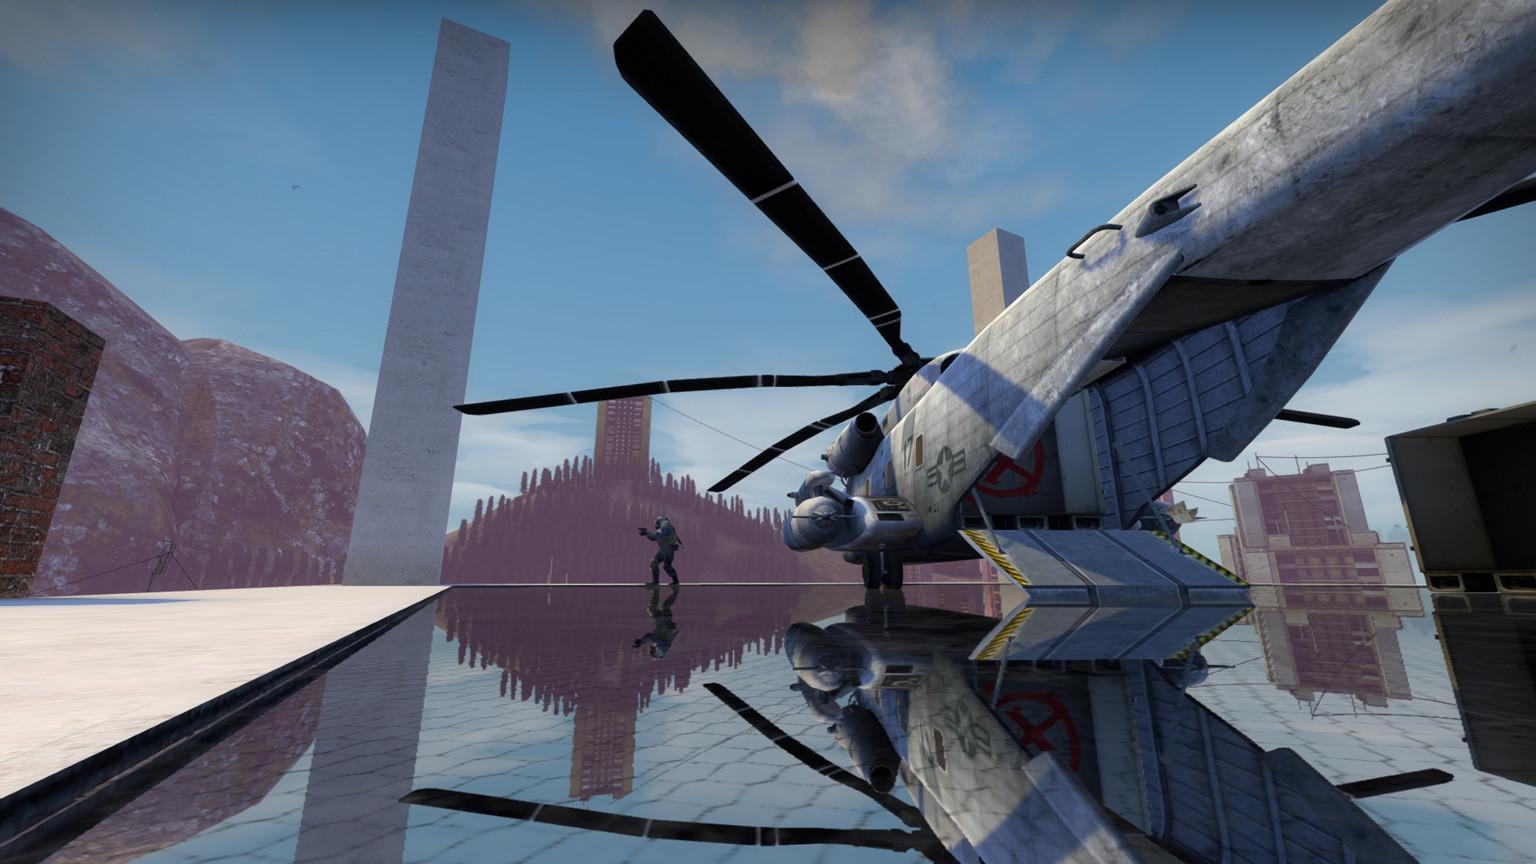 drone_screen_00.jpg.447eb7ec3e11550c7dc1020da4f3130a.jpg